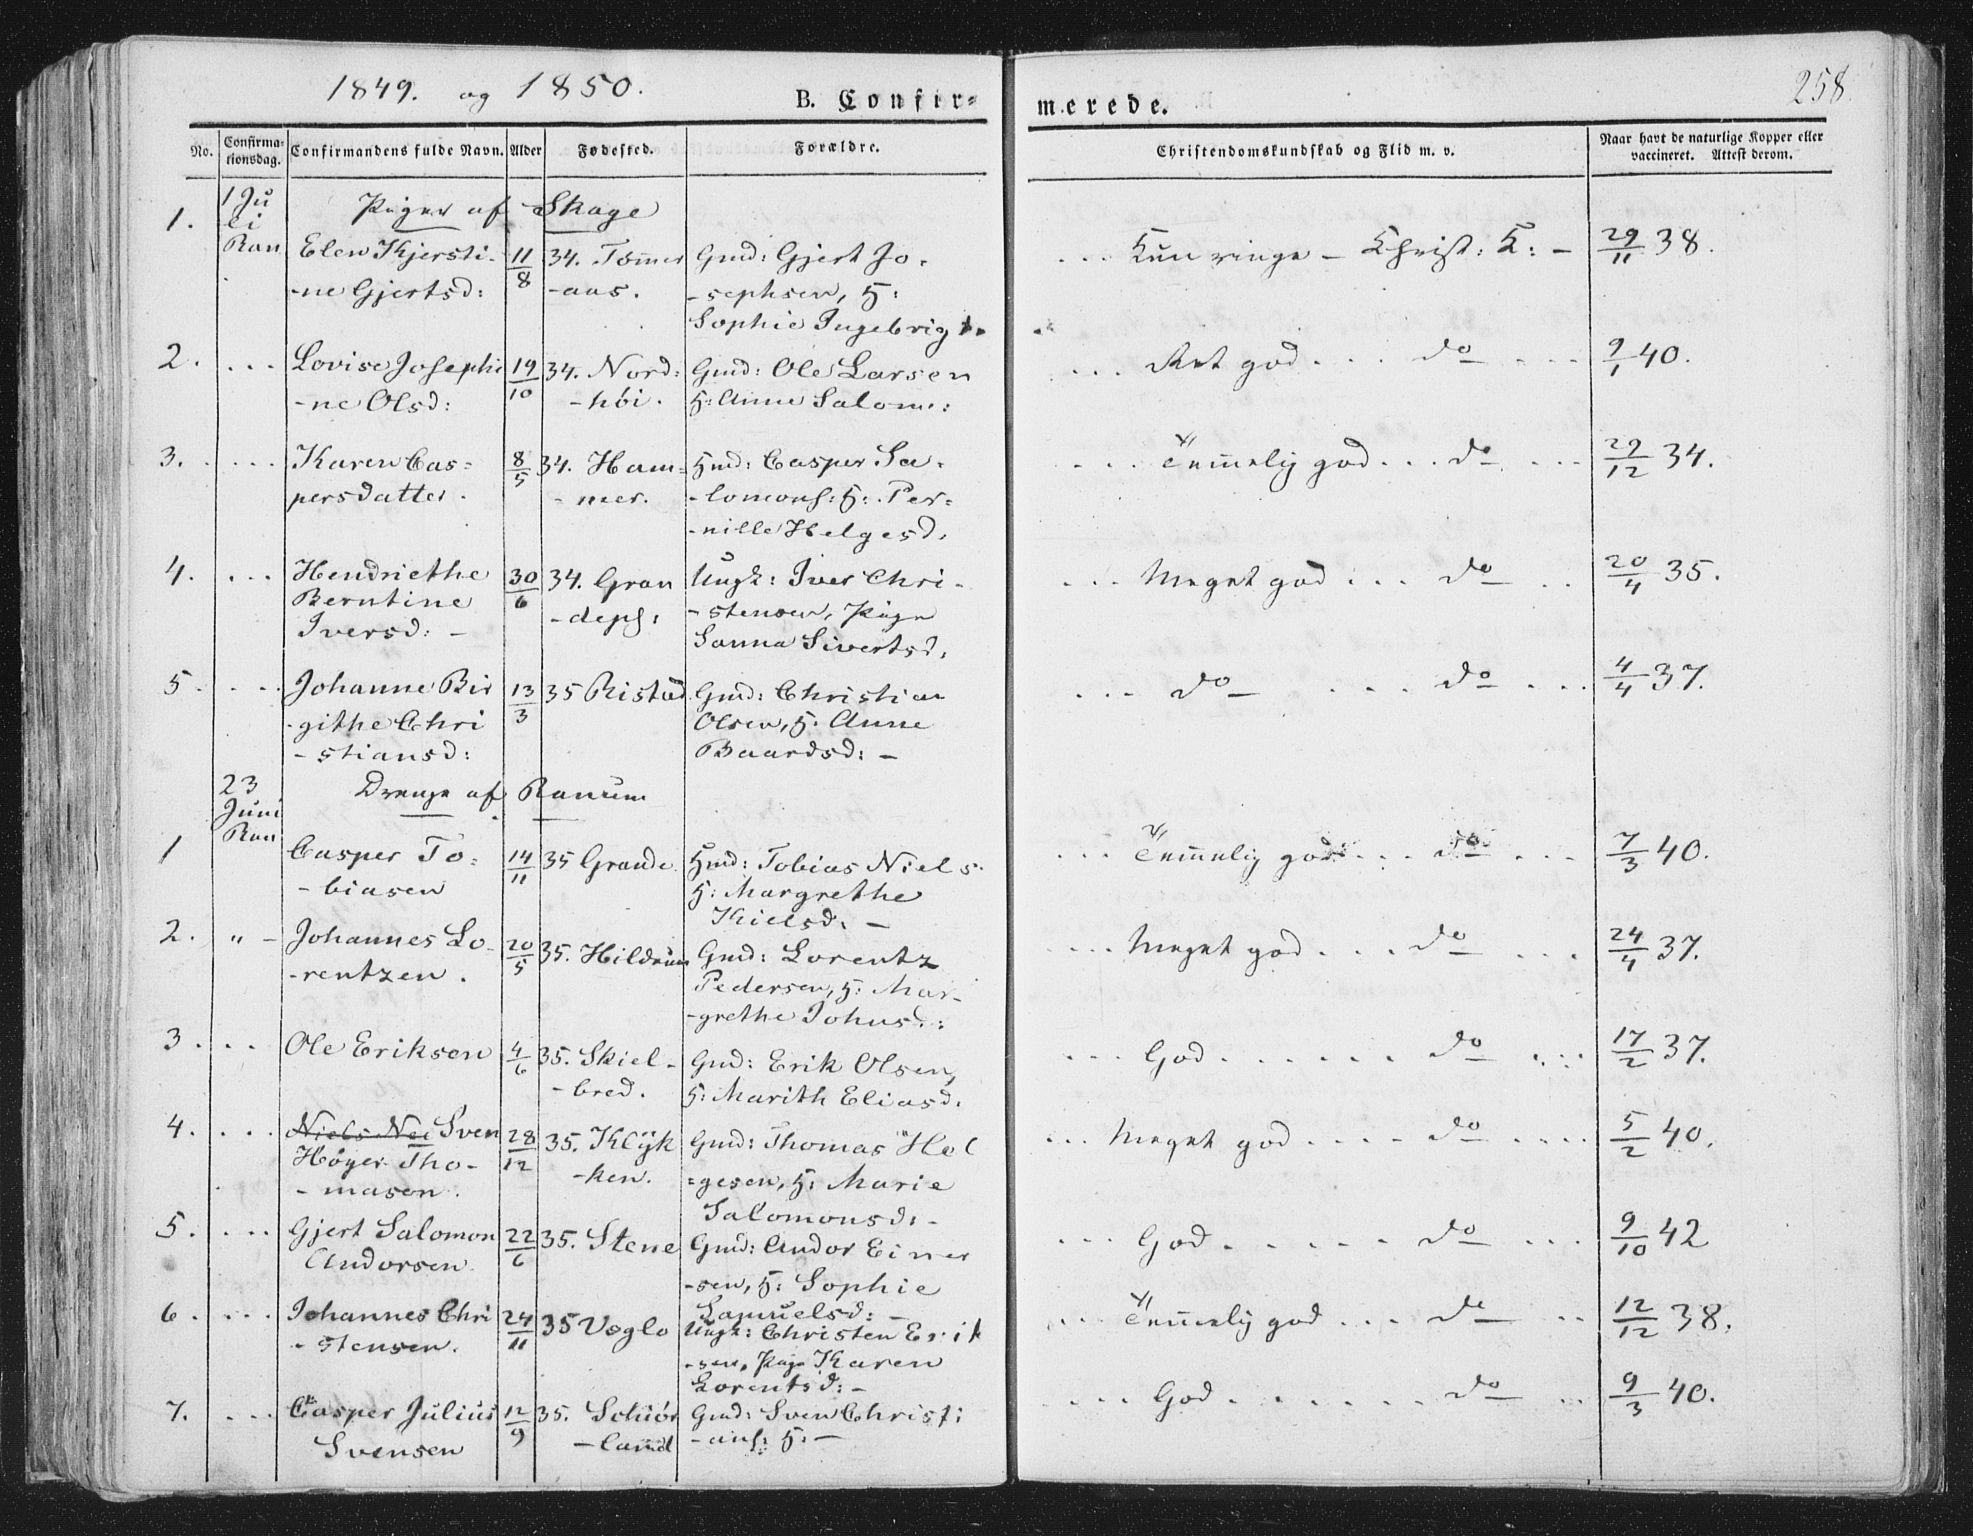 SAT, Ministerialprotokoller, klokkerbøker og fødselsregistre - Nord-Trøndelag, 764/L0551: Ministerialbok nr. 764A07a, 1824-1864, s. 258